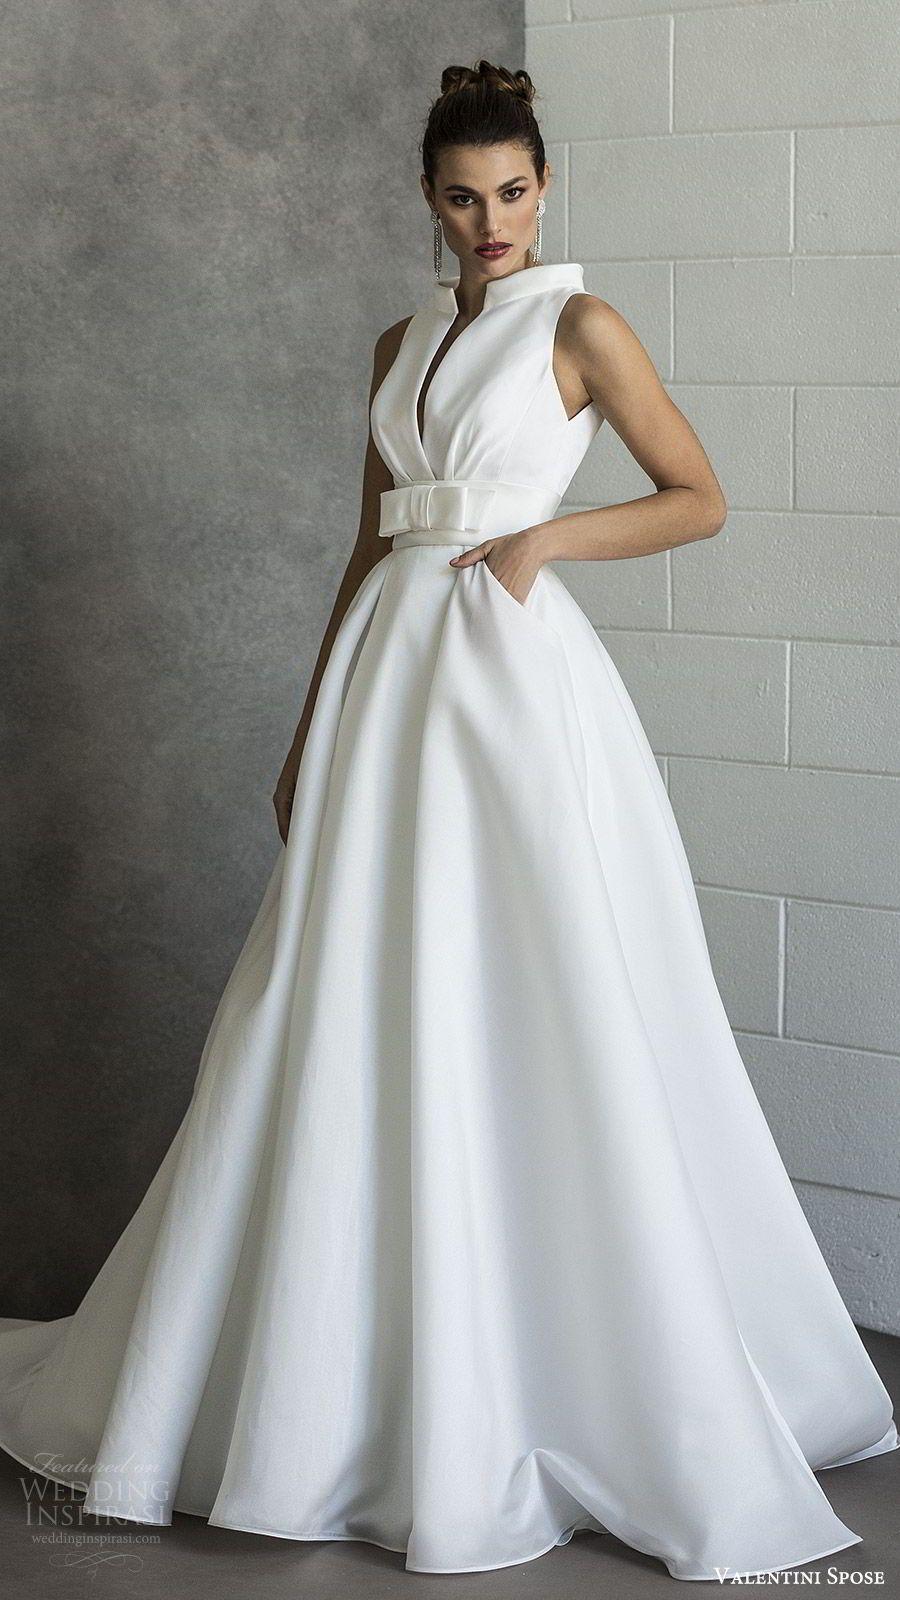 Valentini Spose Spring 2020 Wedding Dresses Pronovias